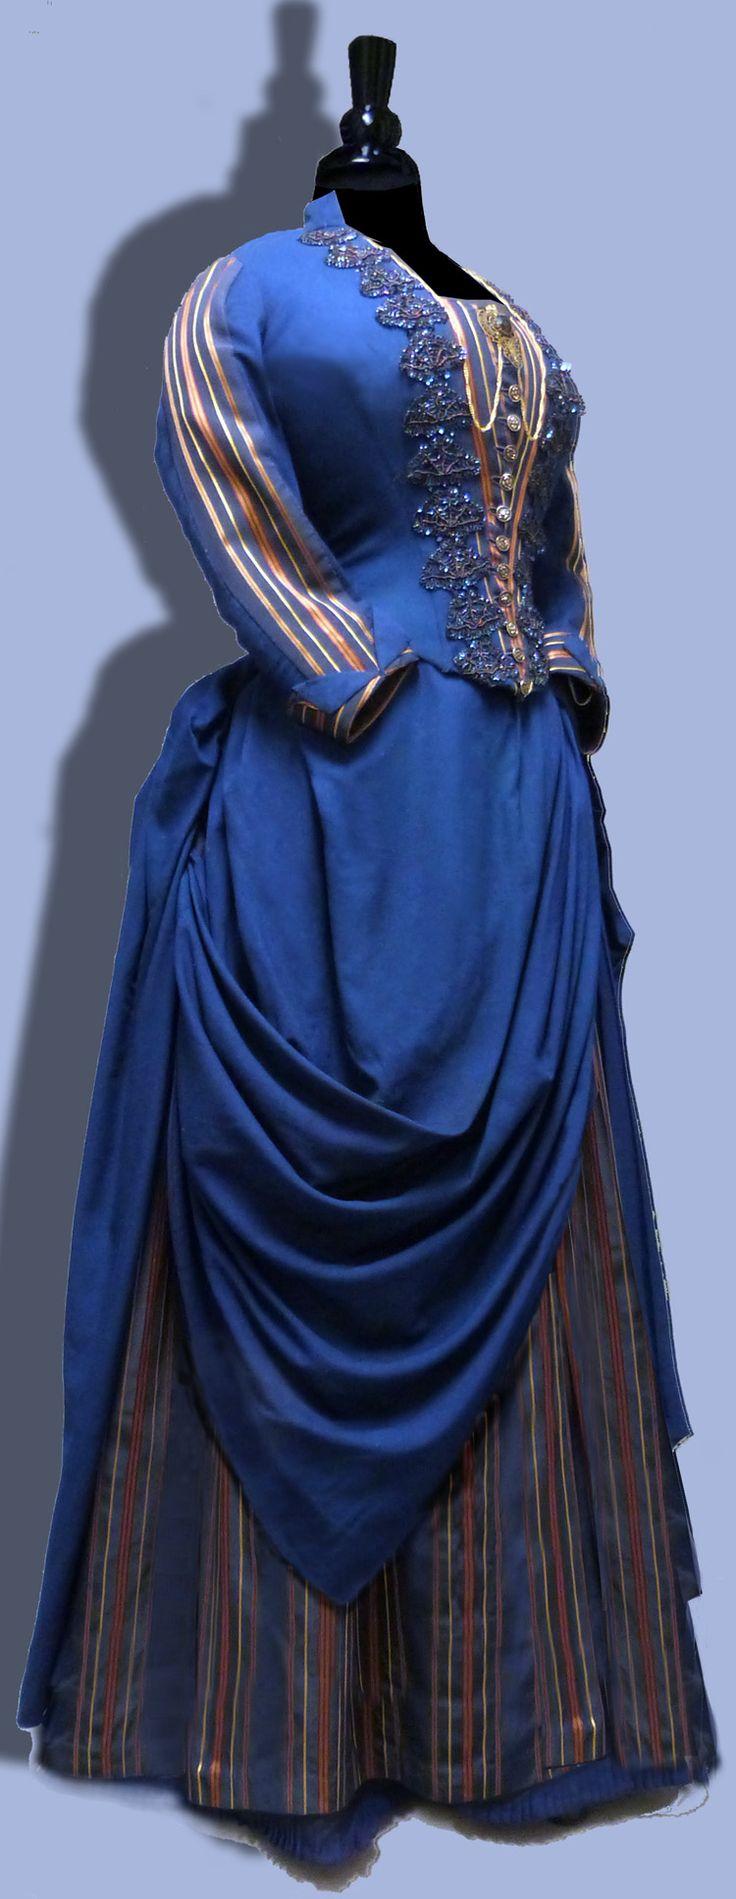 Blue Serge Dress